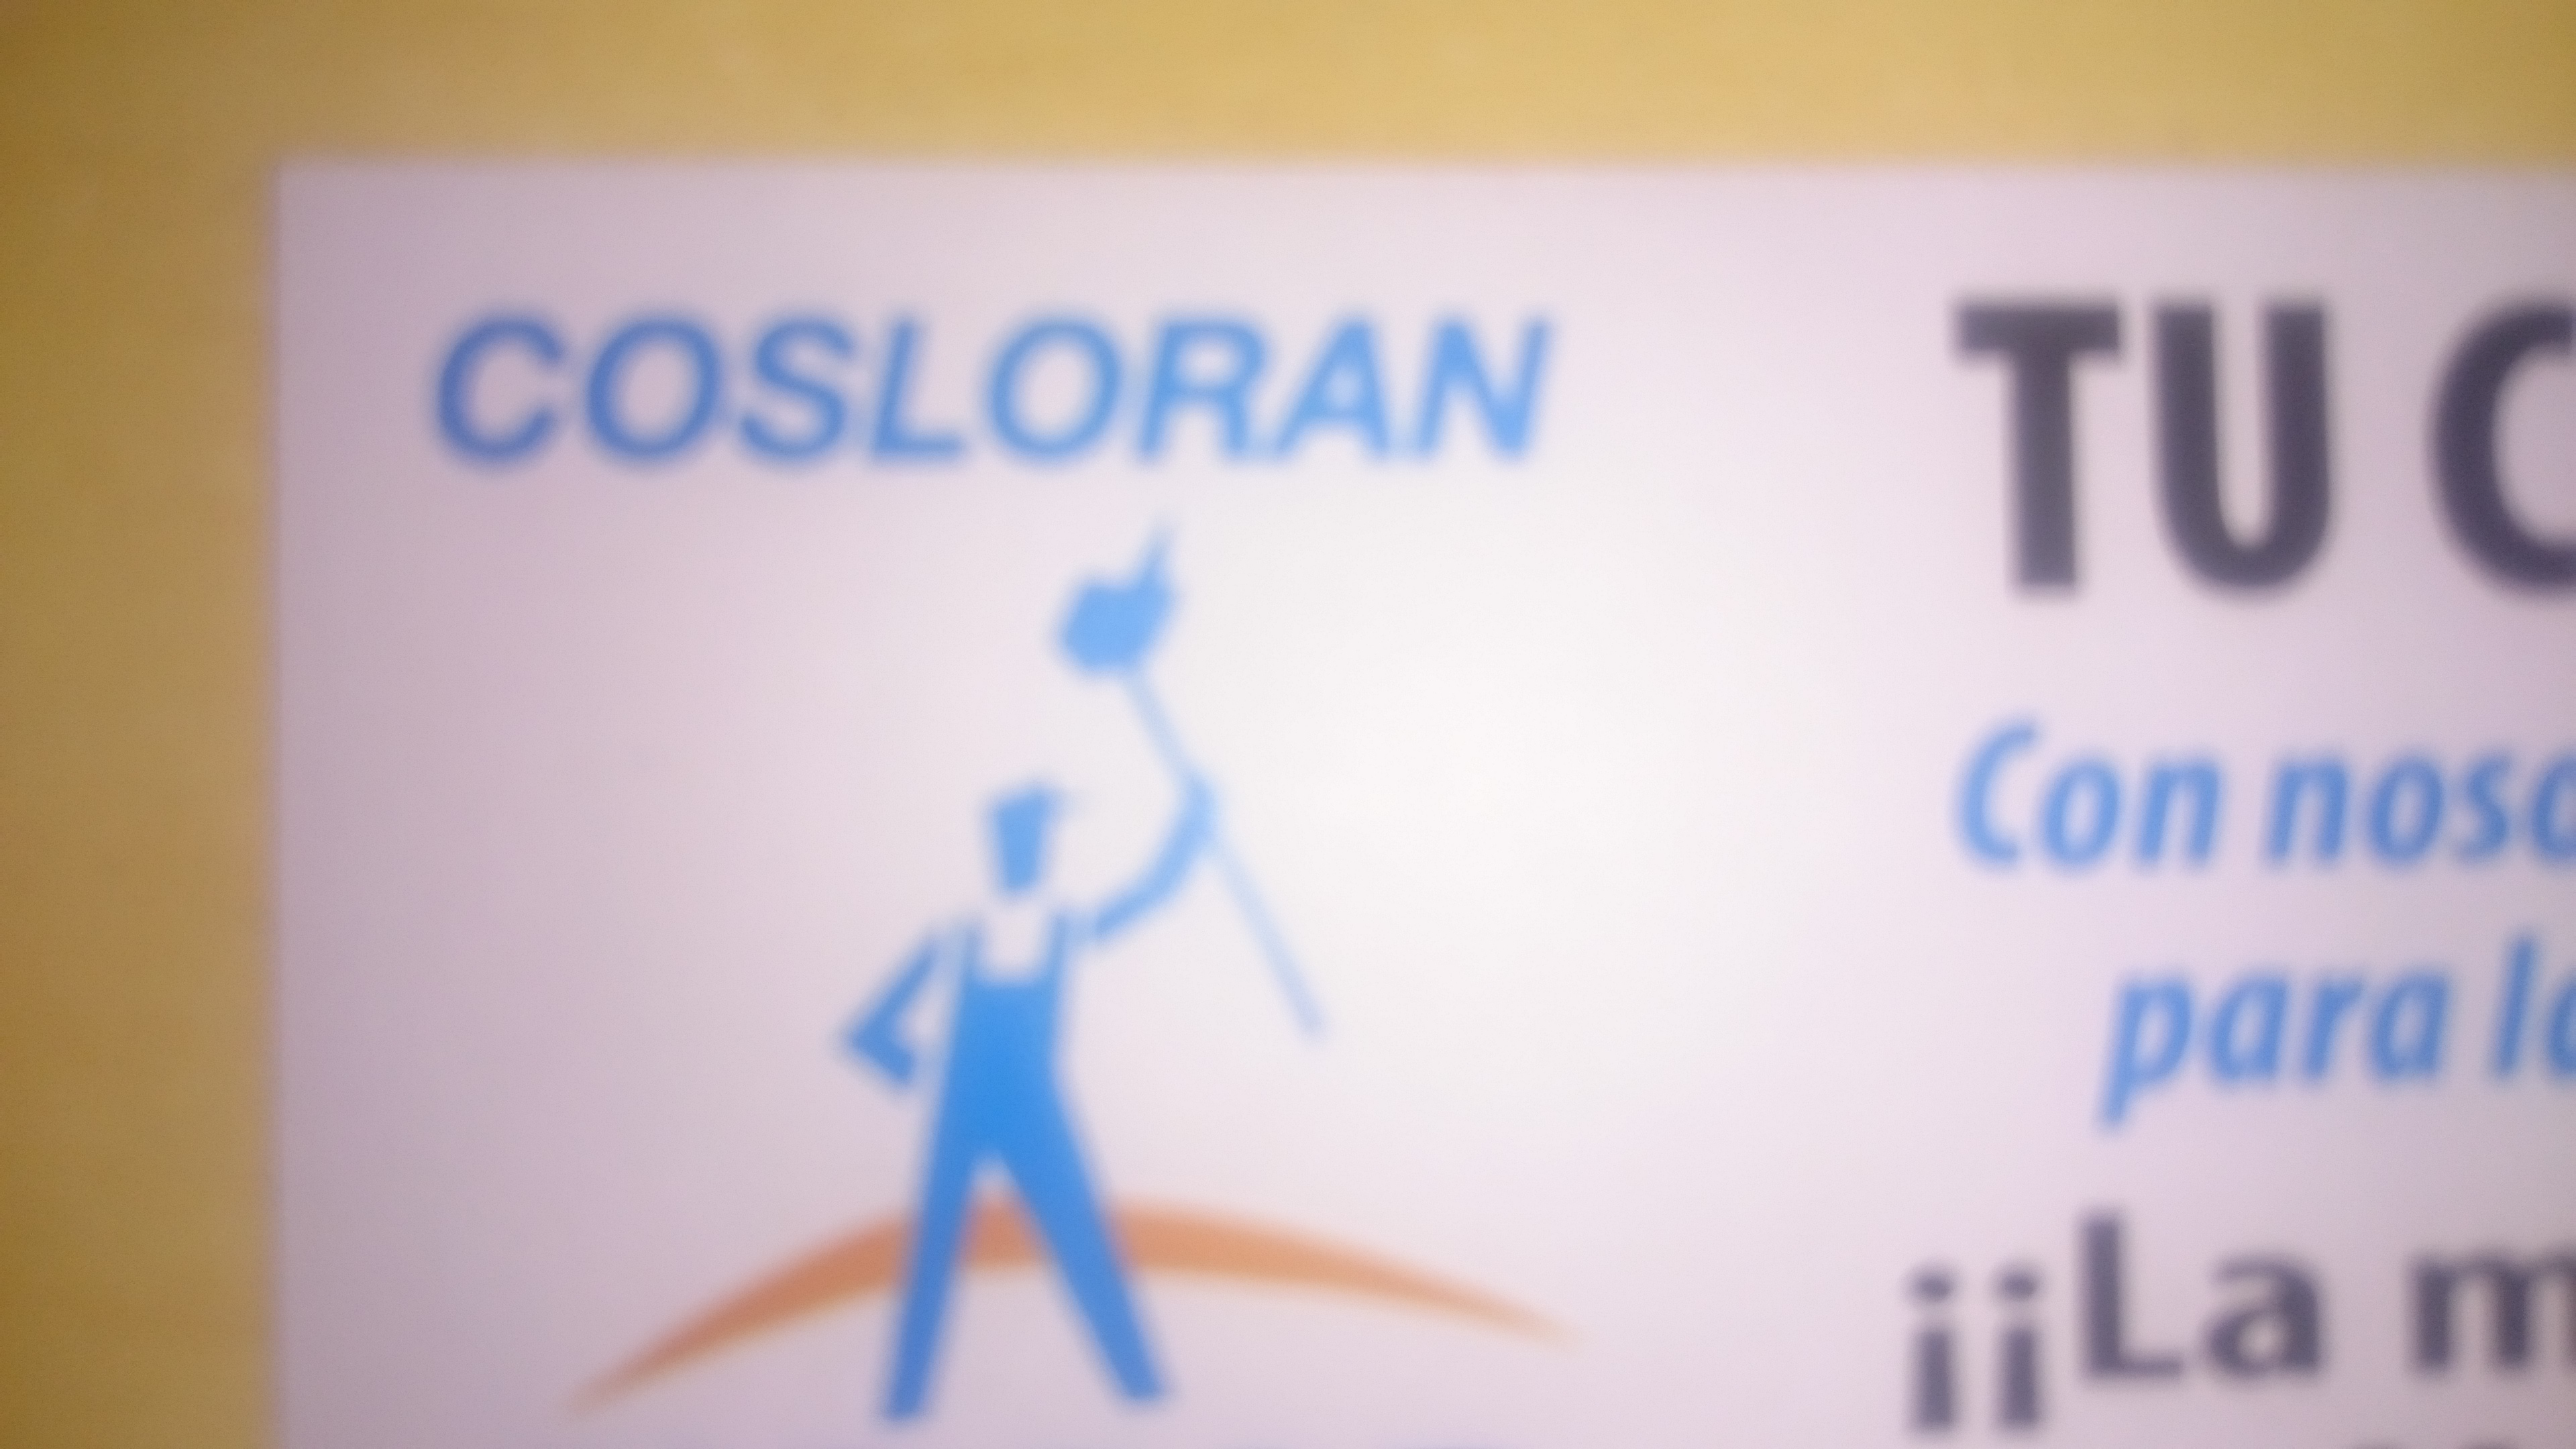 Cosloran